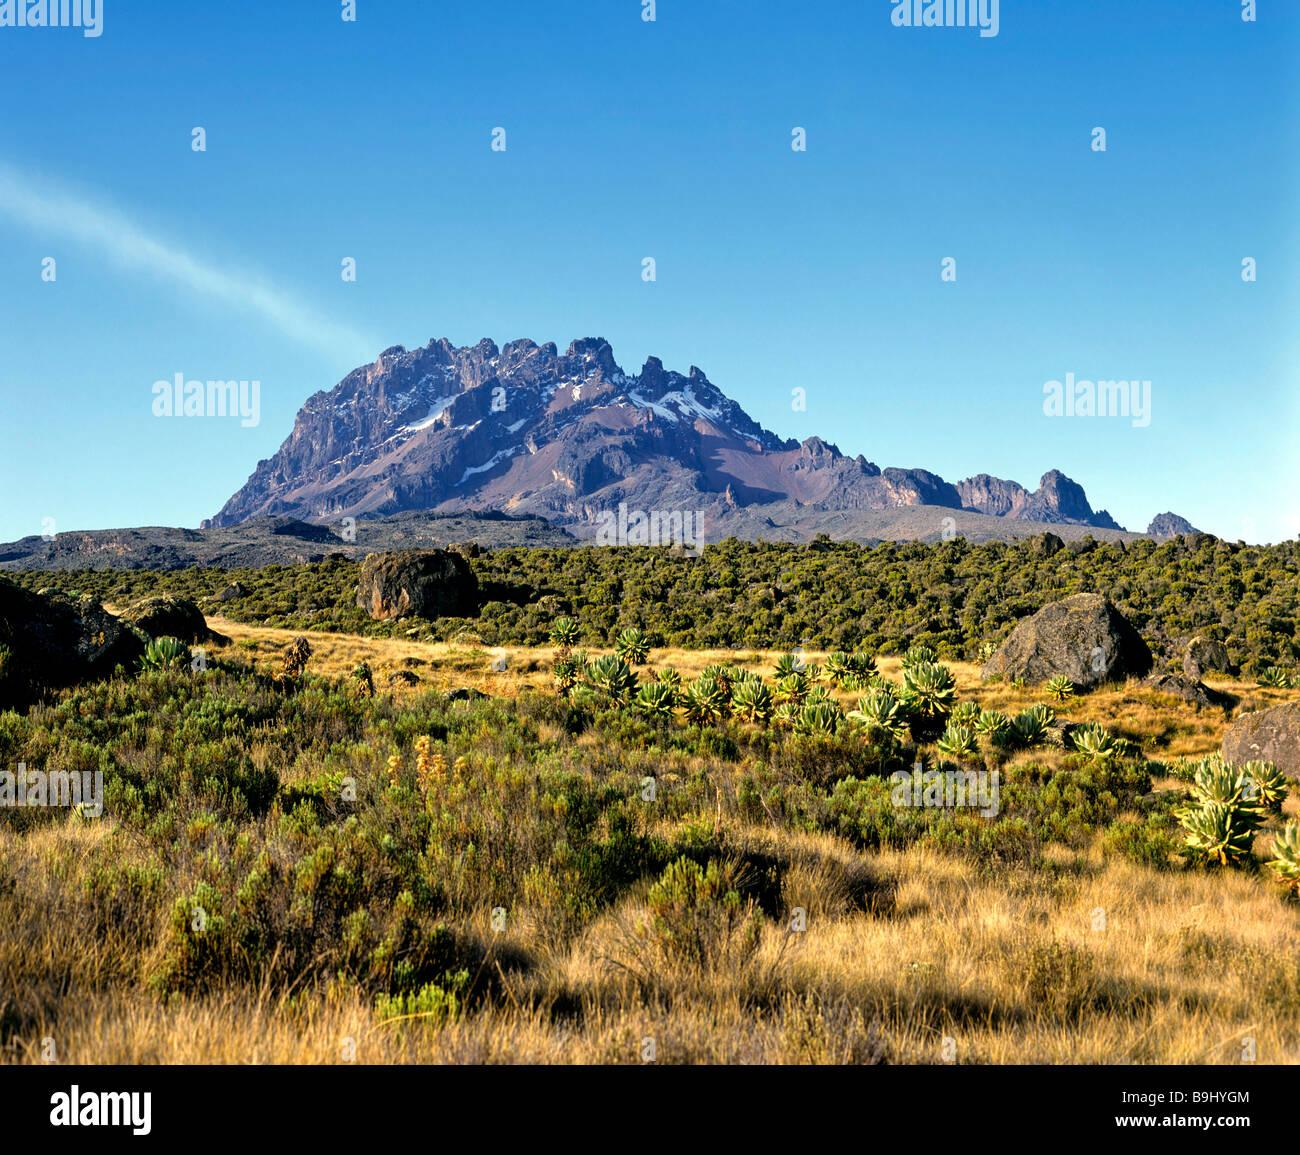 Mawenzi, 5148 metres, Mount Kilimanjaro, National Park, Tanzania, East Africa - Stock Image